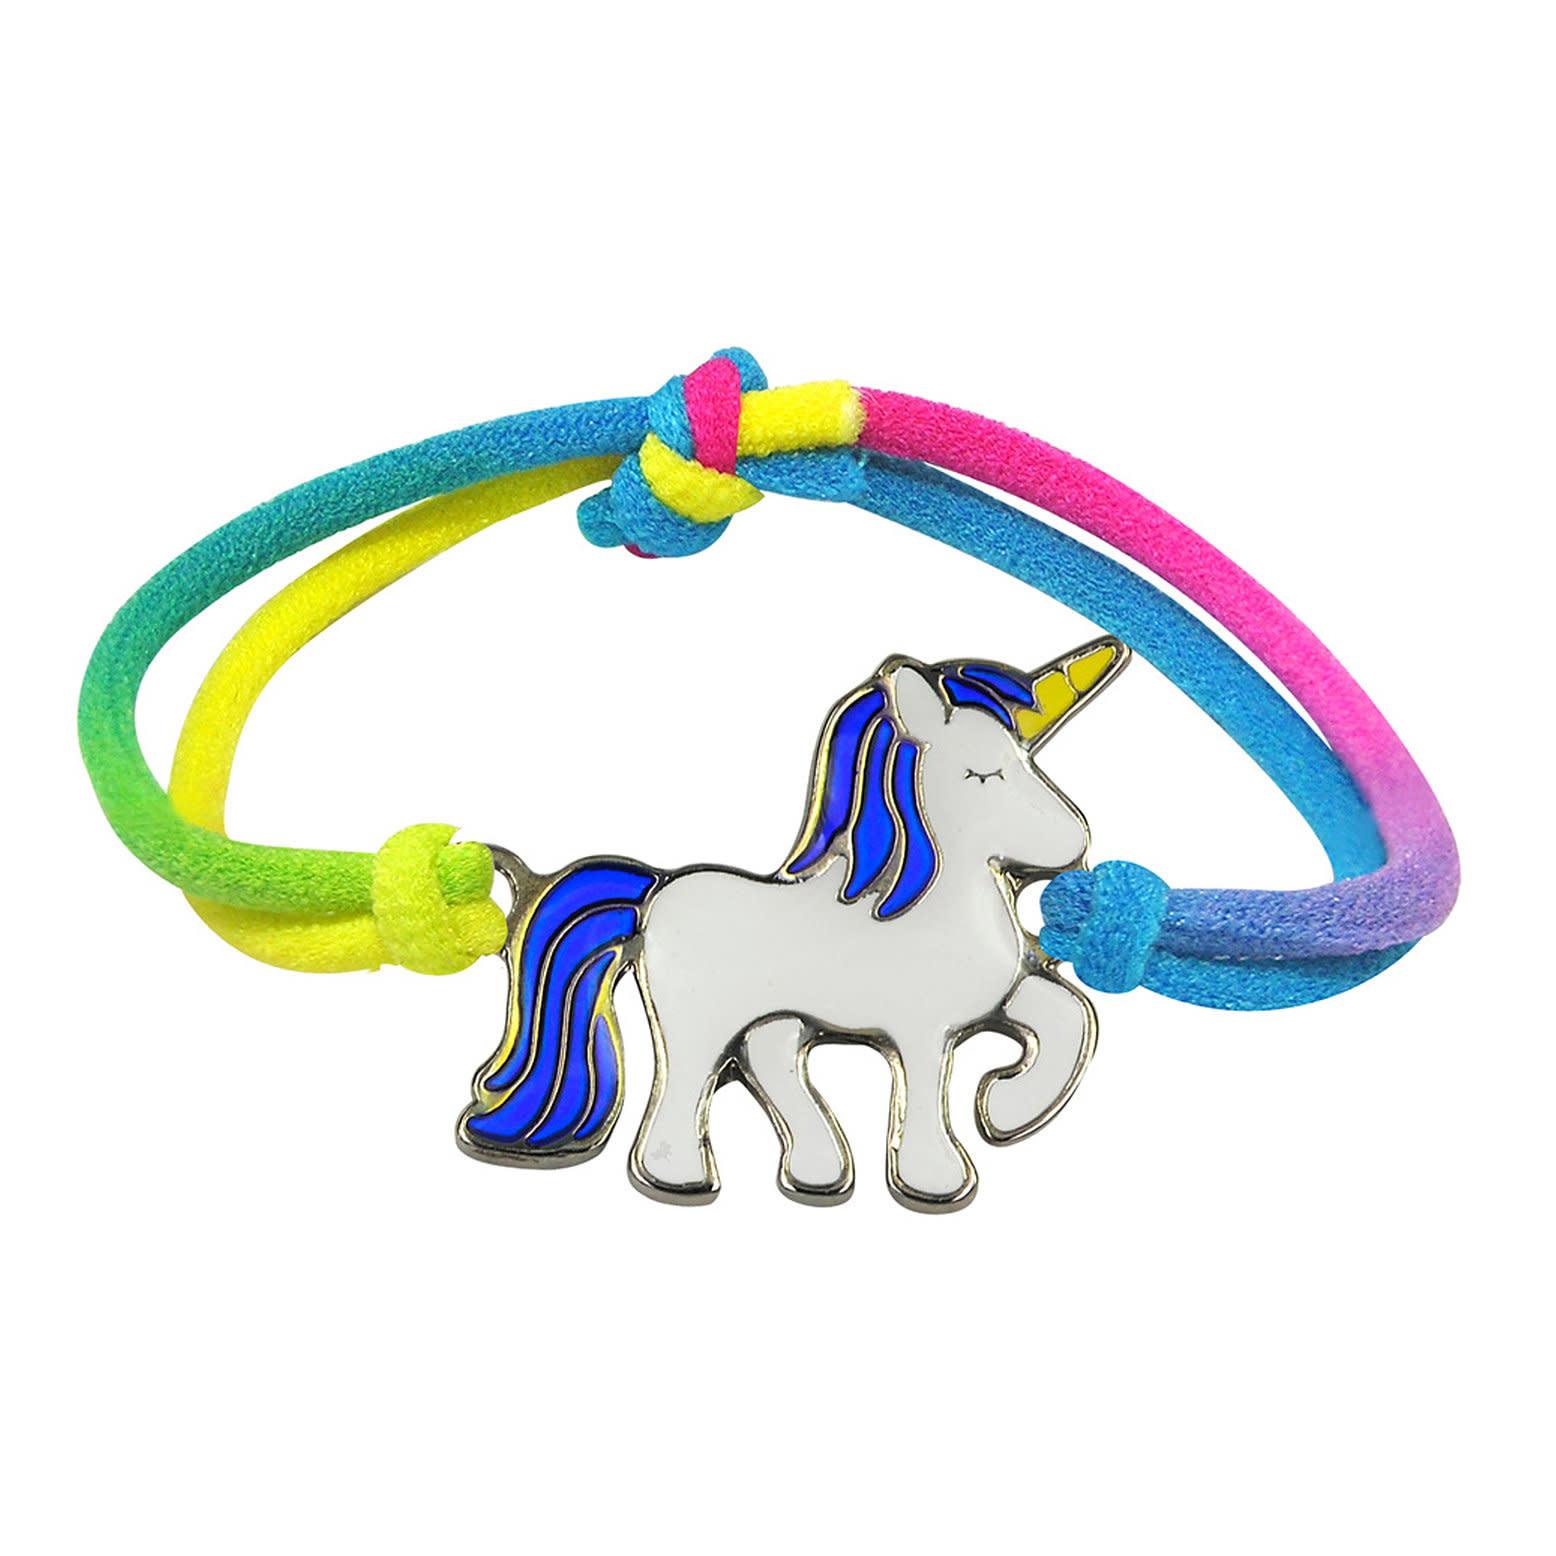 AWST Bracelet - Trotting Unicorn, Color Changing